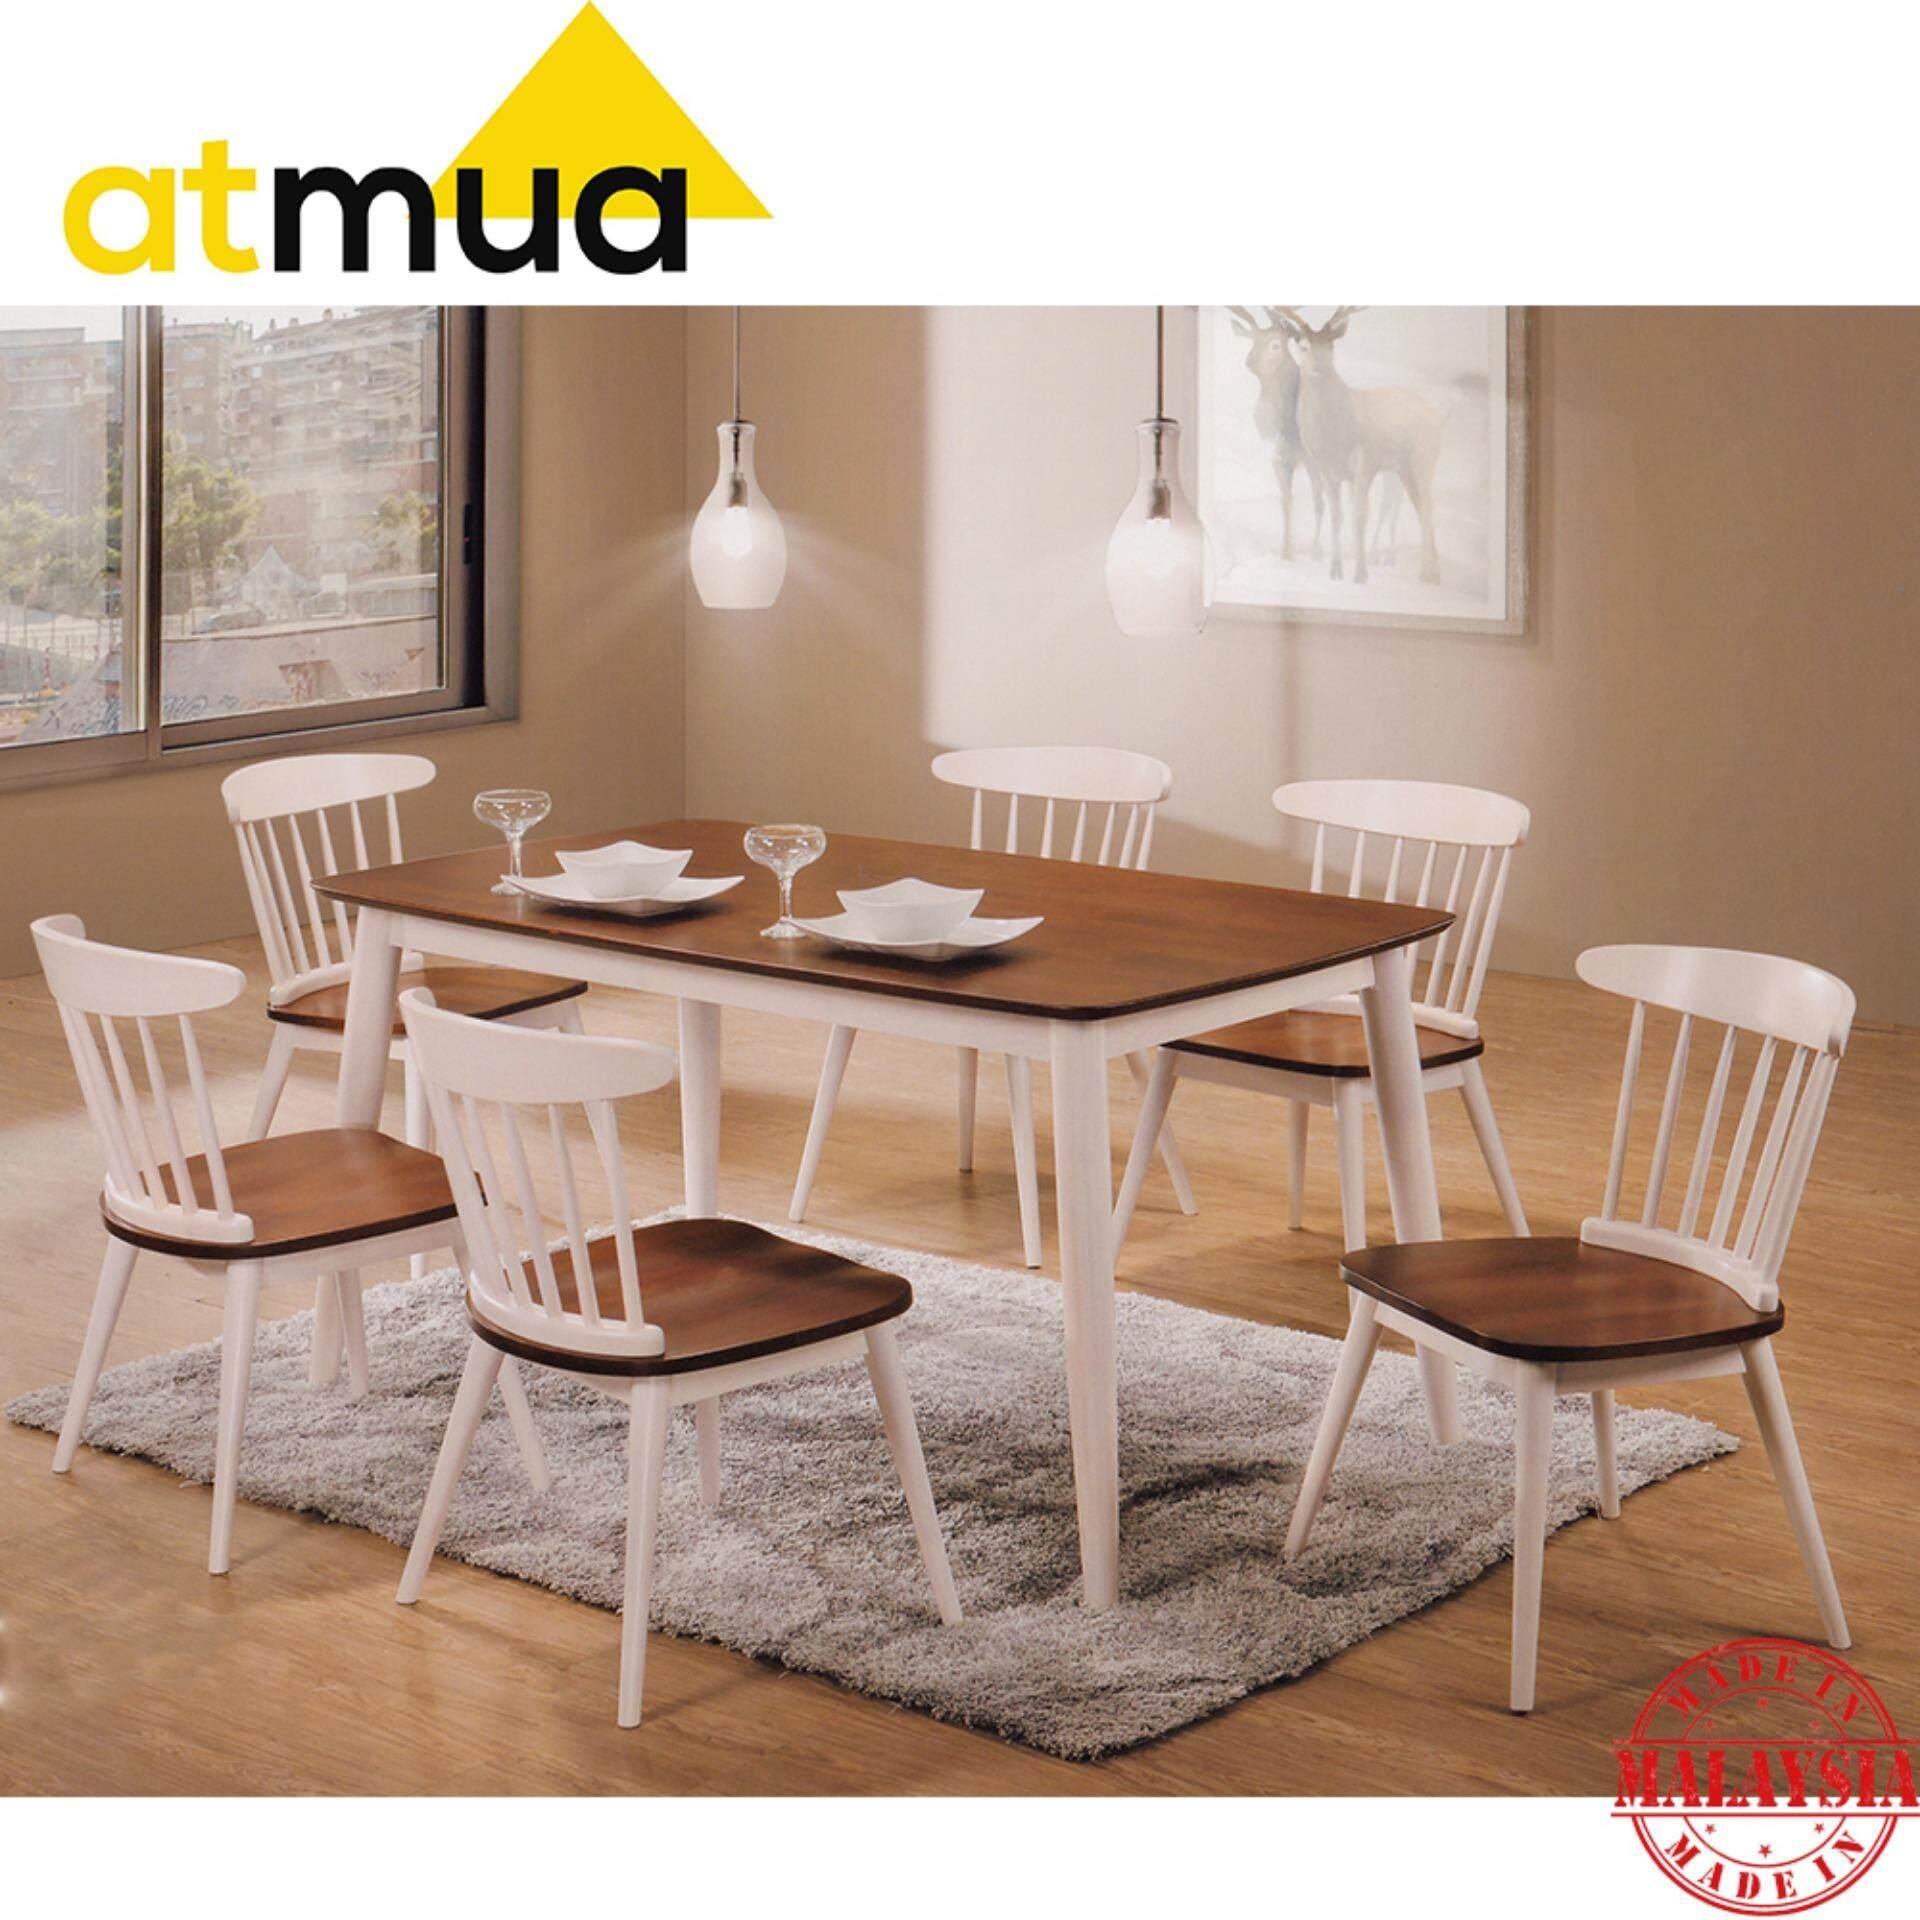 Atmua Gordon Scandinavian Dining Set (1 Table + 6 Chair) [Full Solid Rubber Wood]